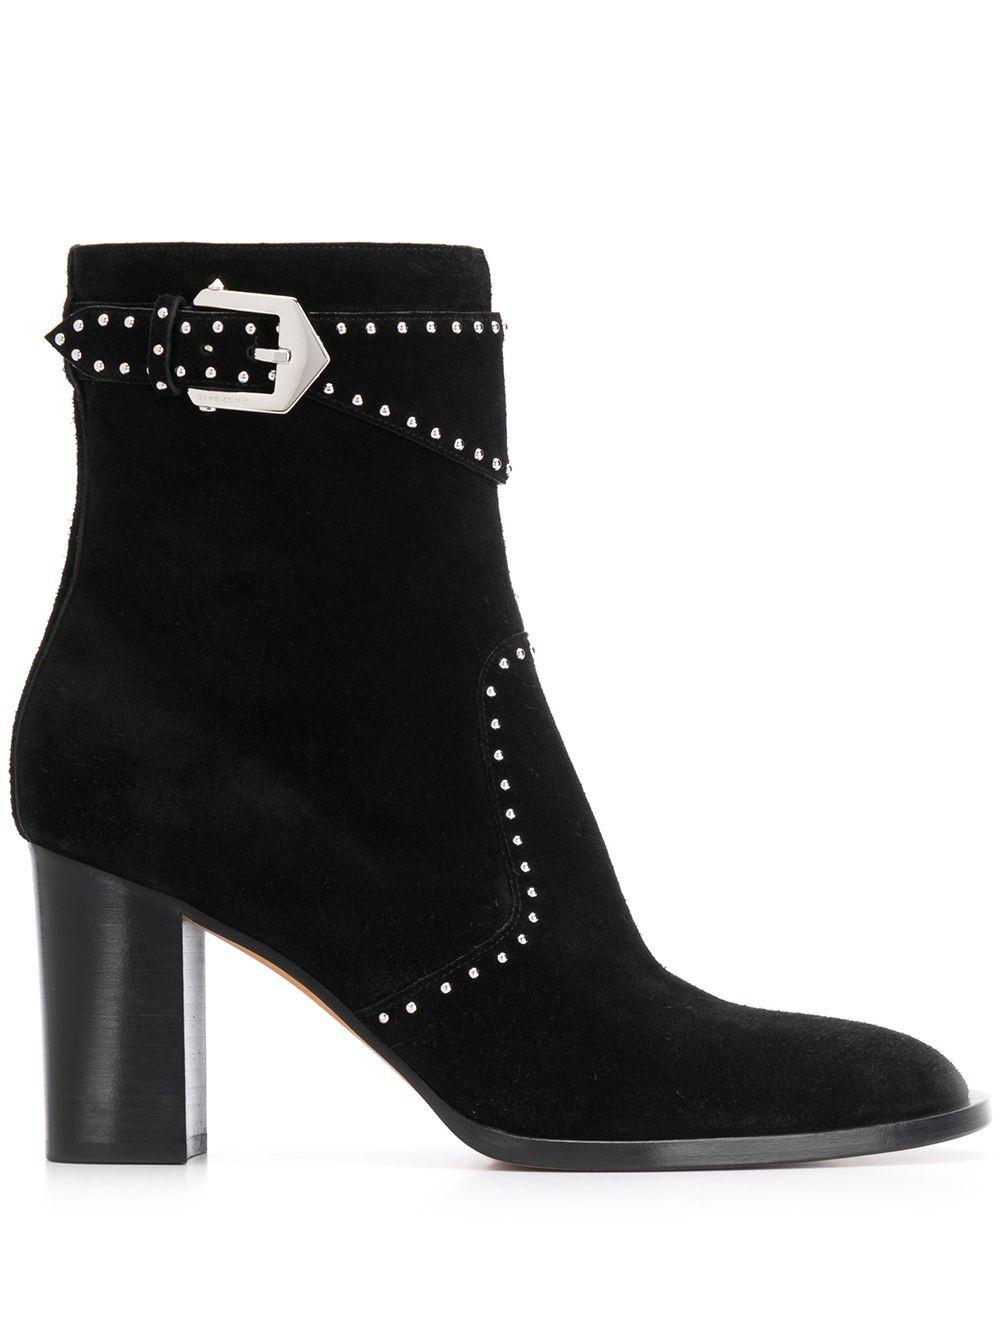 Givenchy bottines Elegant